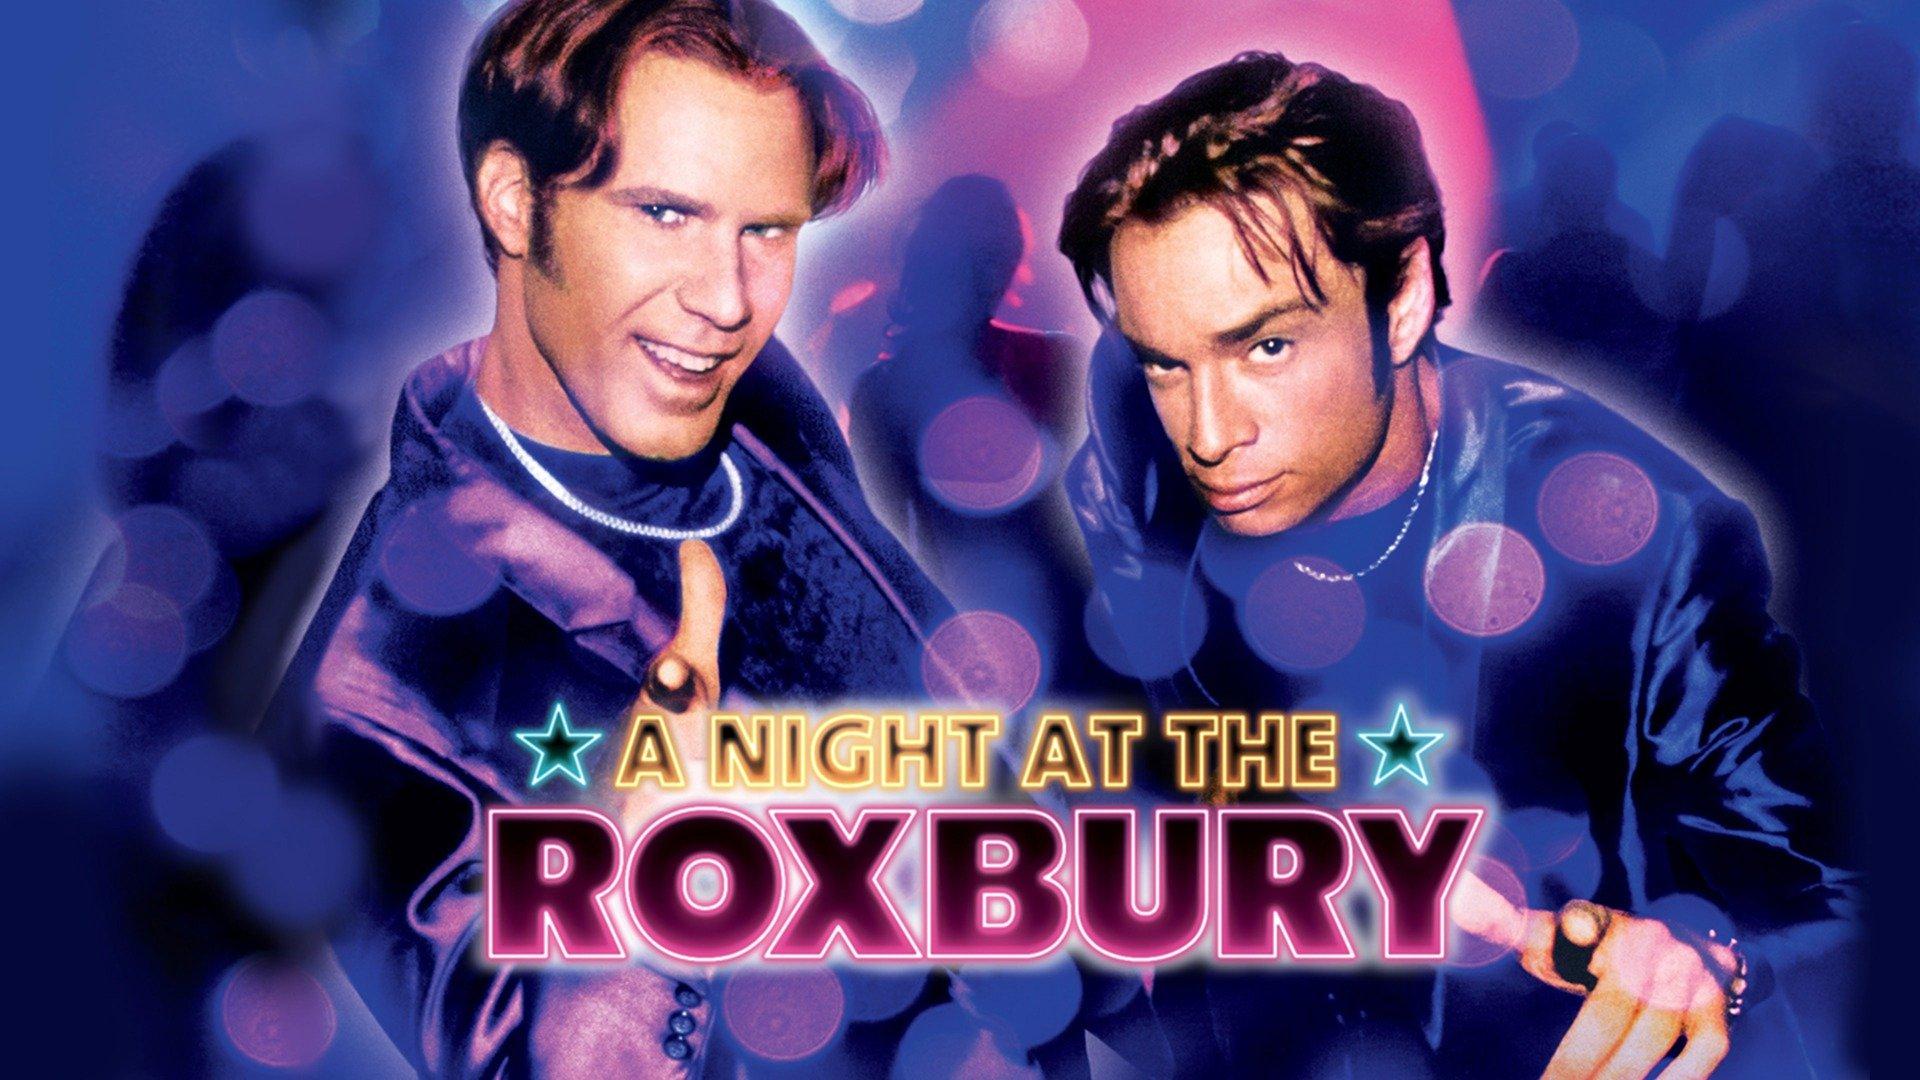 A Night at the Roxbury | MovieTickets